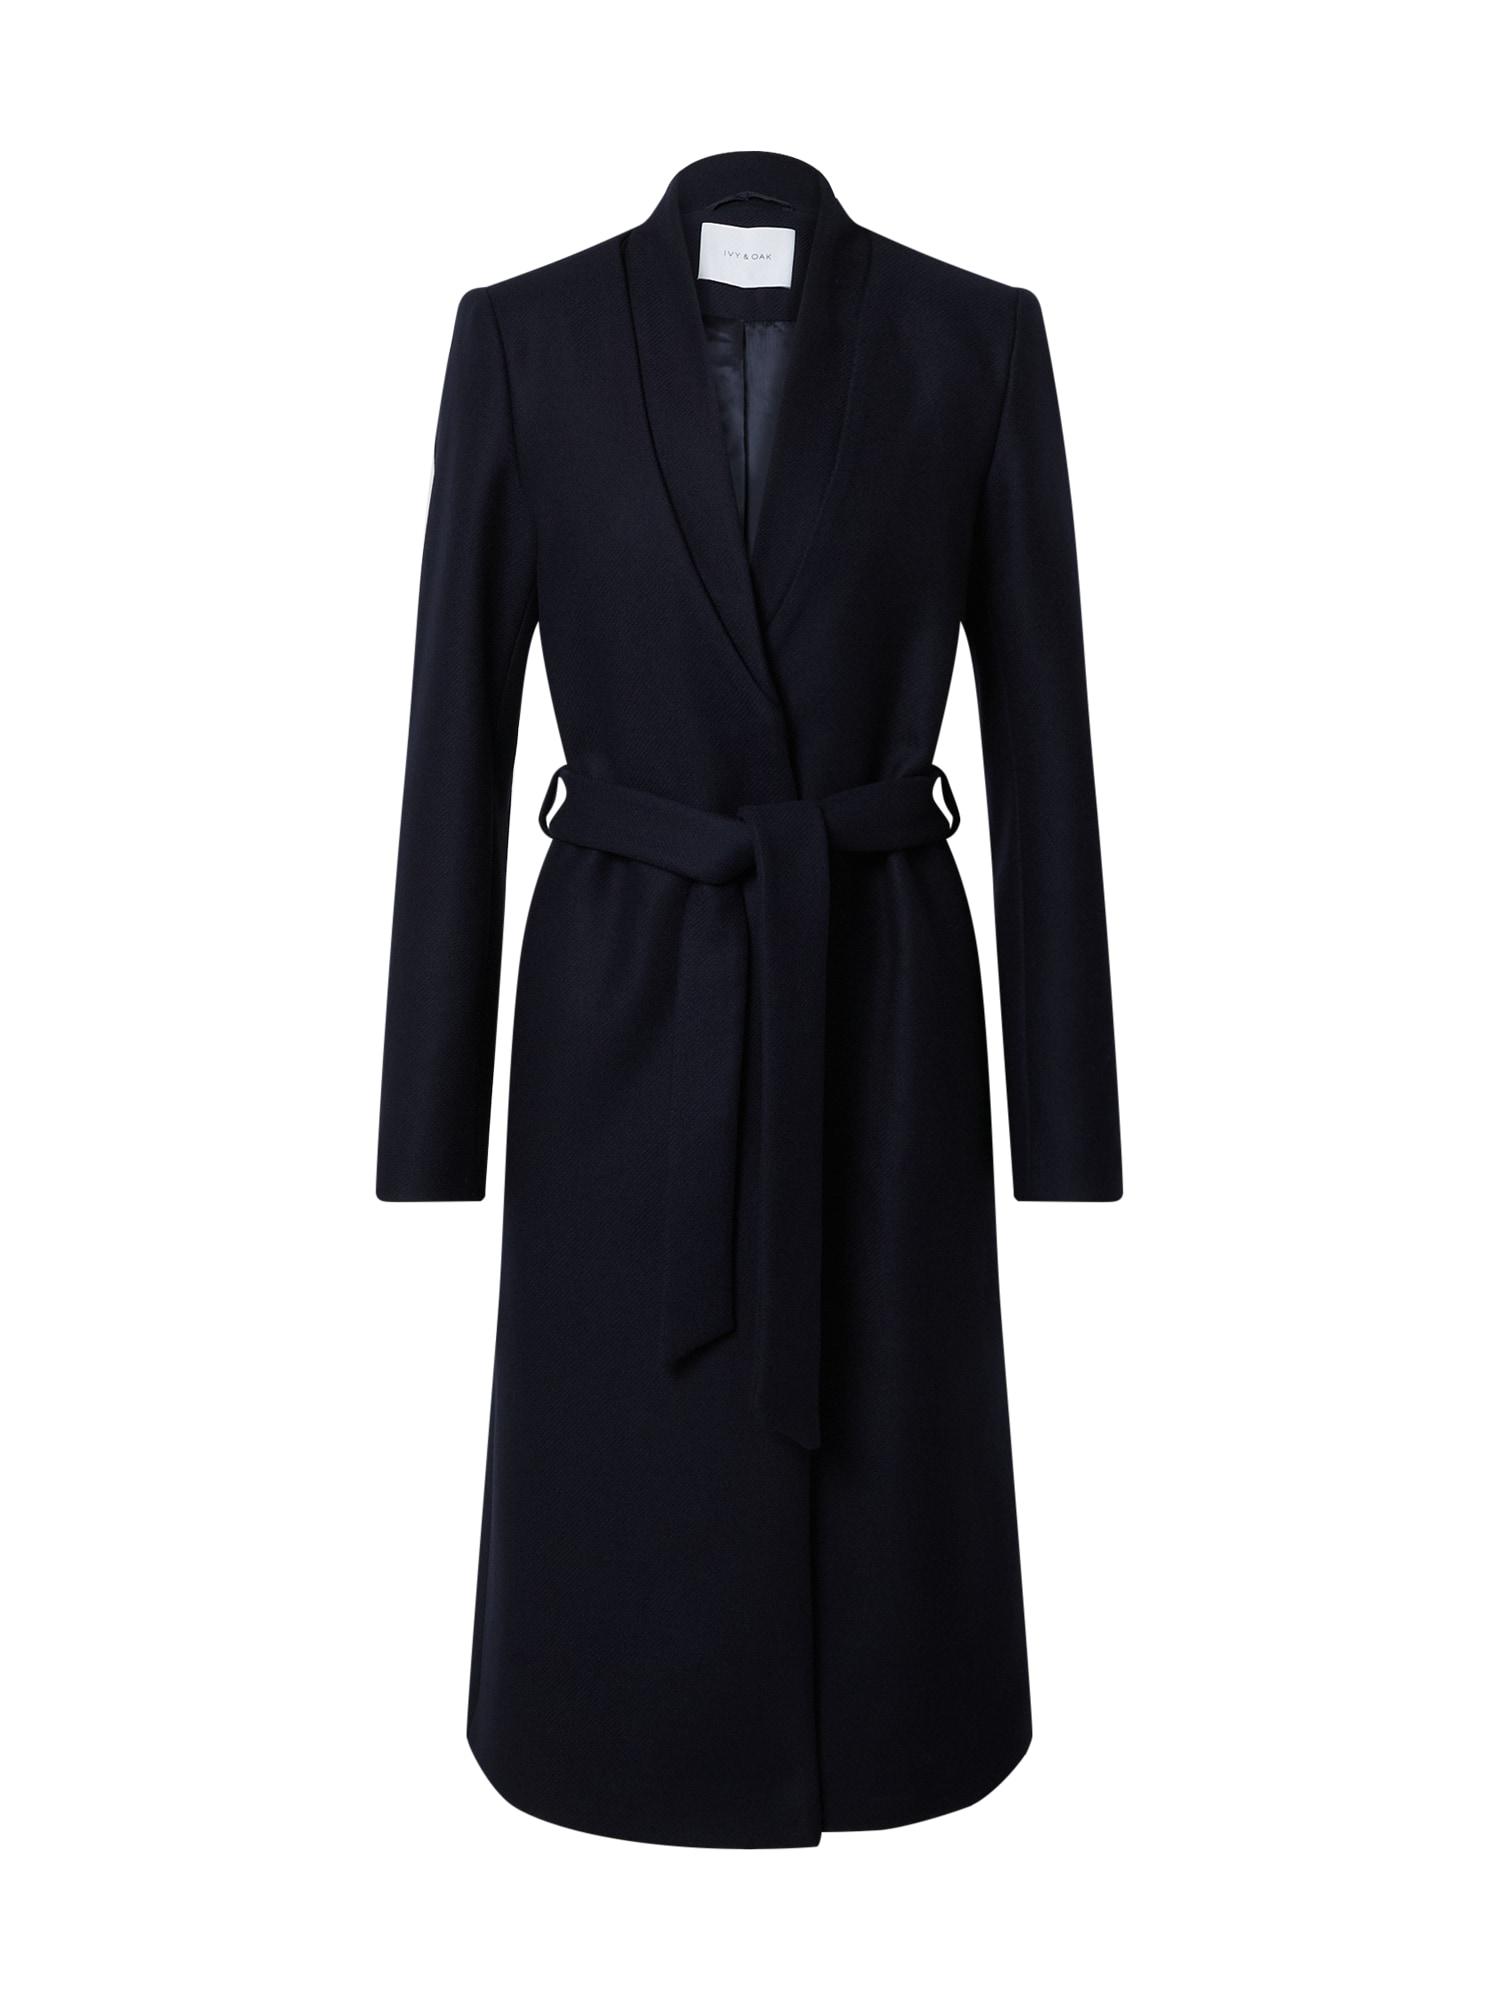 IVY & OAK Demisezoninis paltas nakties mėlyna